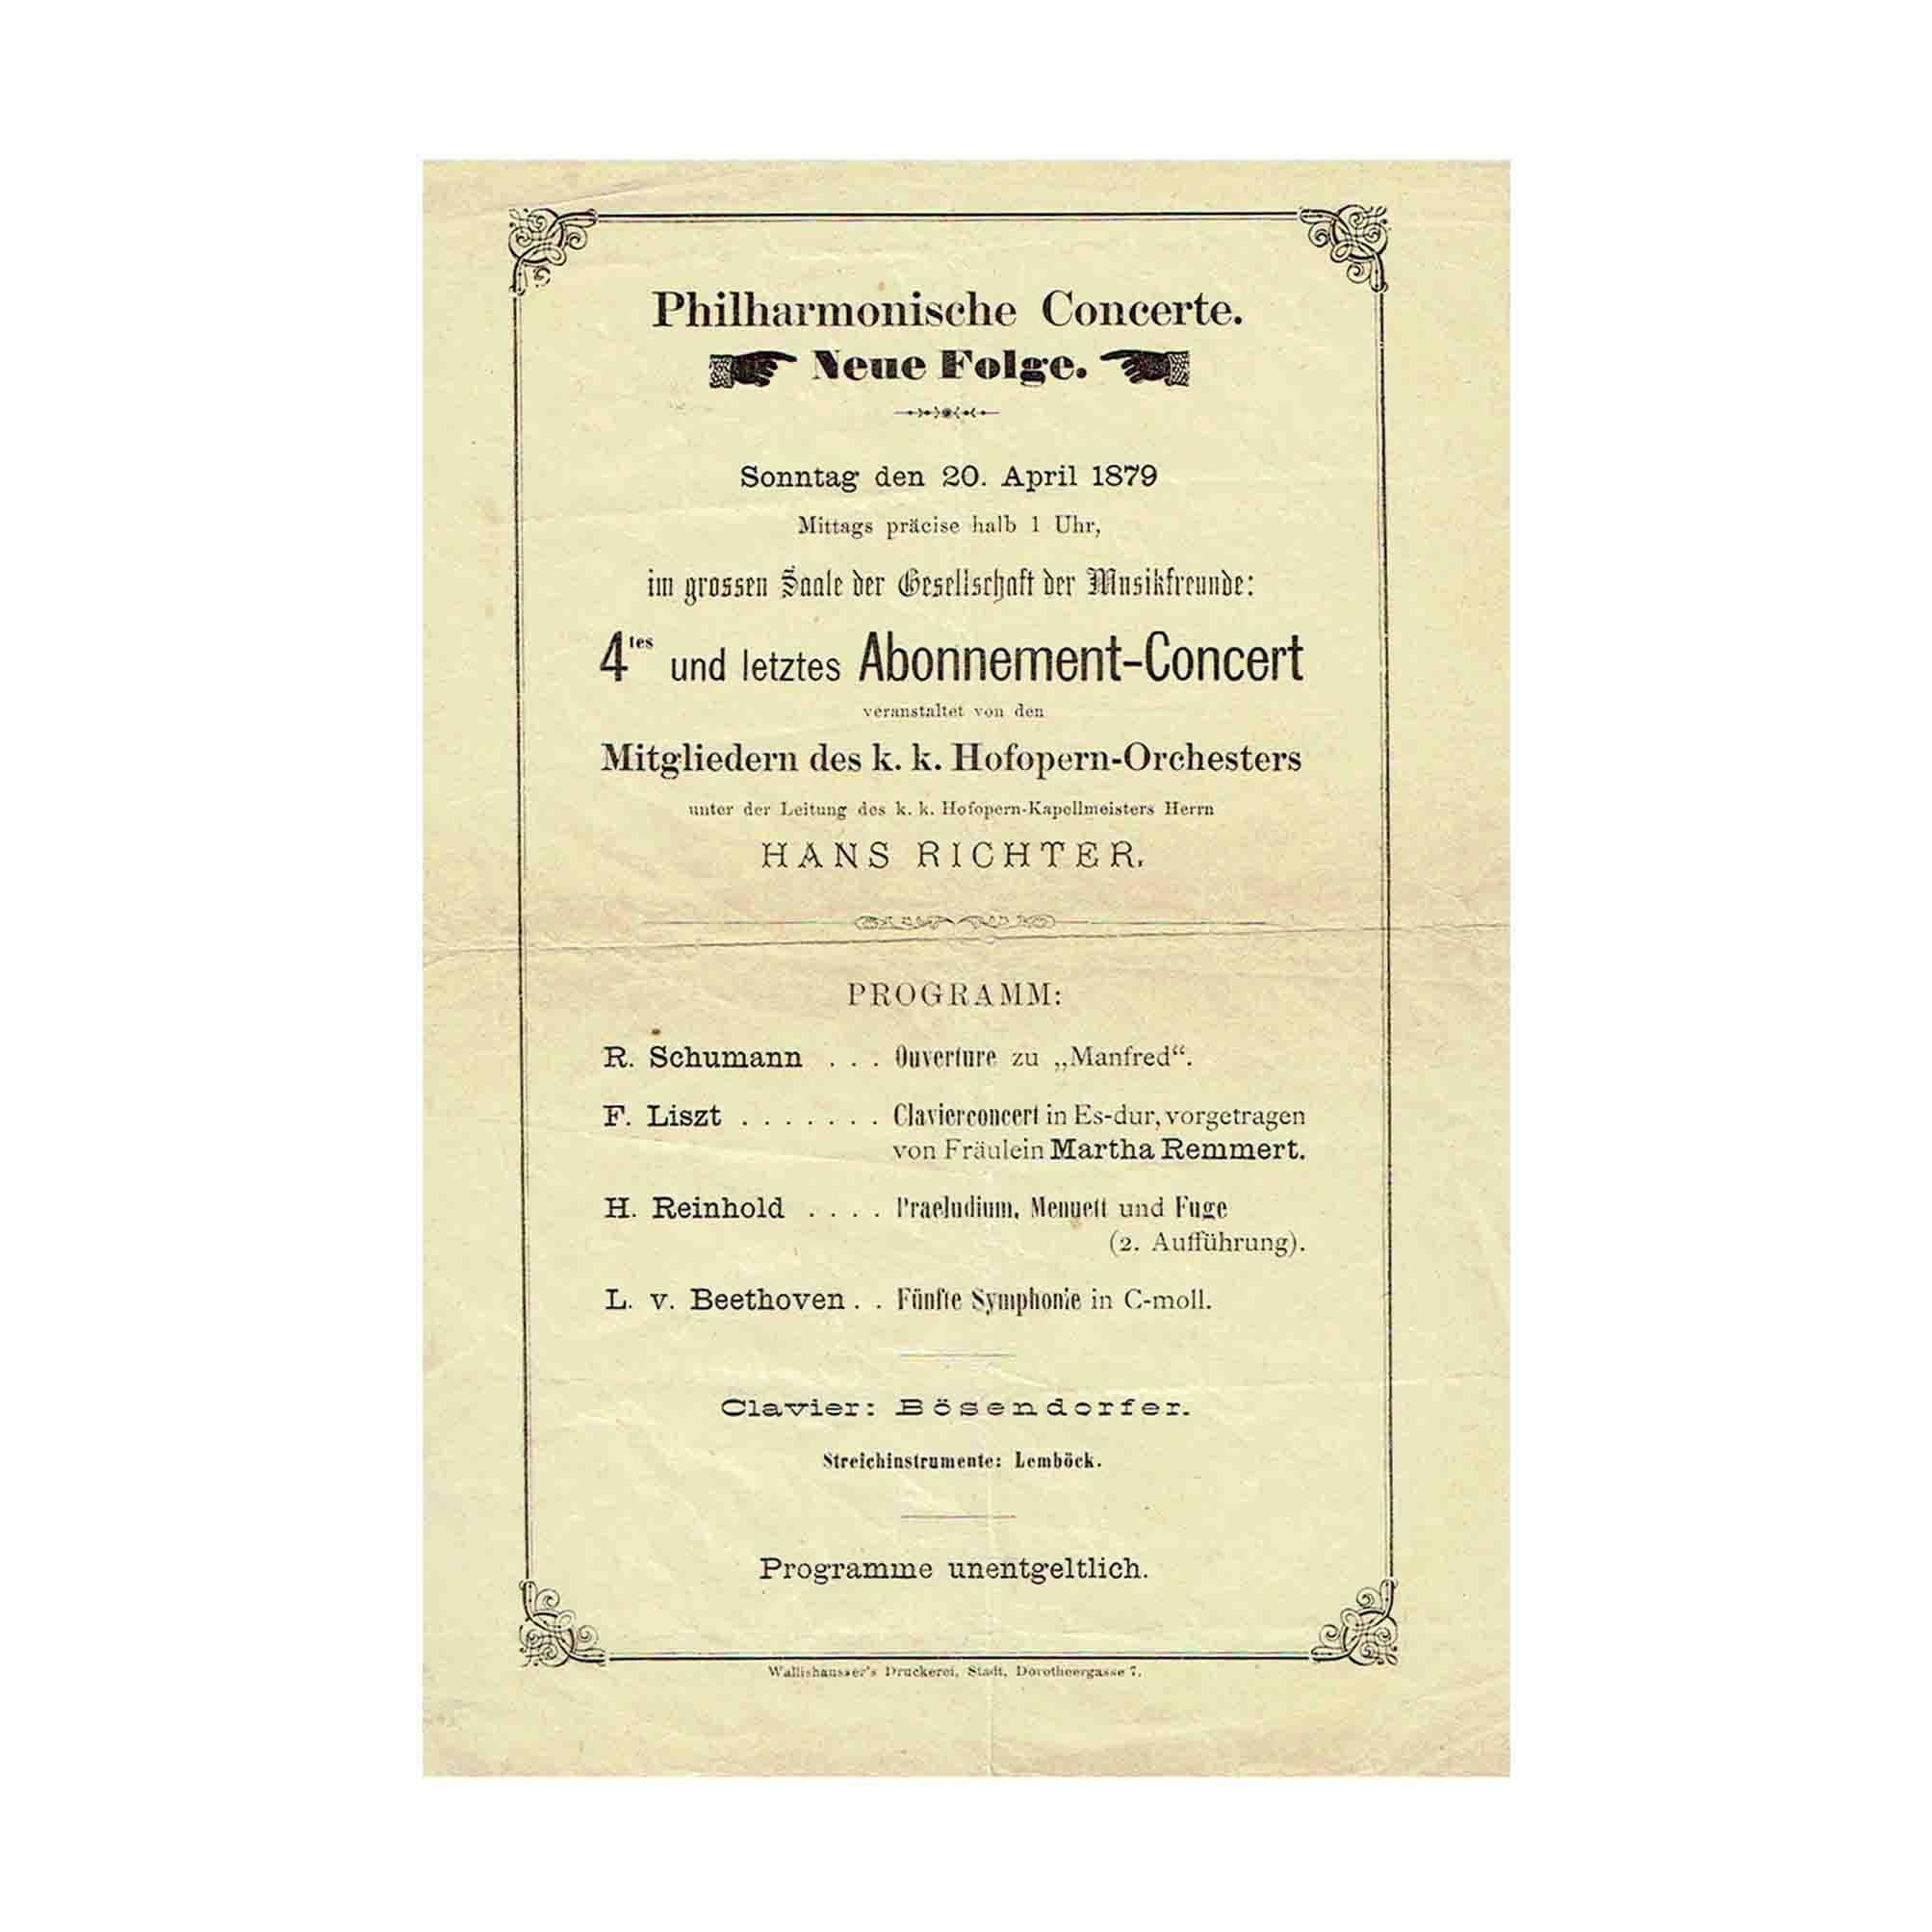 5480-Programmblatt-Musikverein-Konzert-Musikverein-20.-April-1879-A-N.jpg